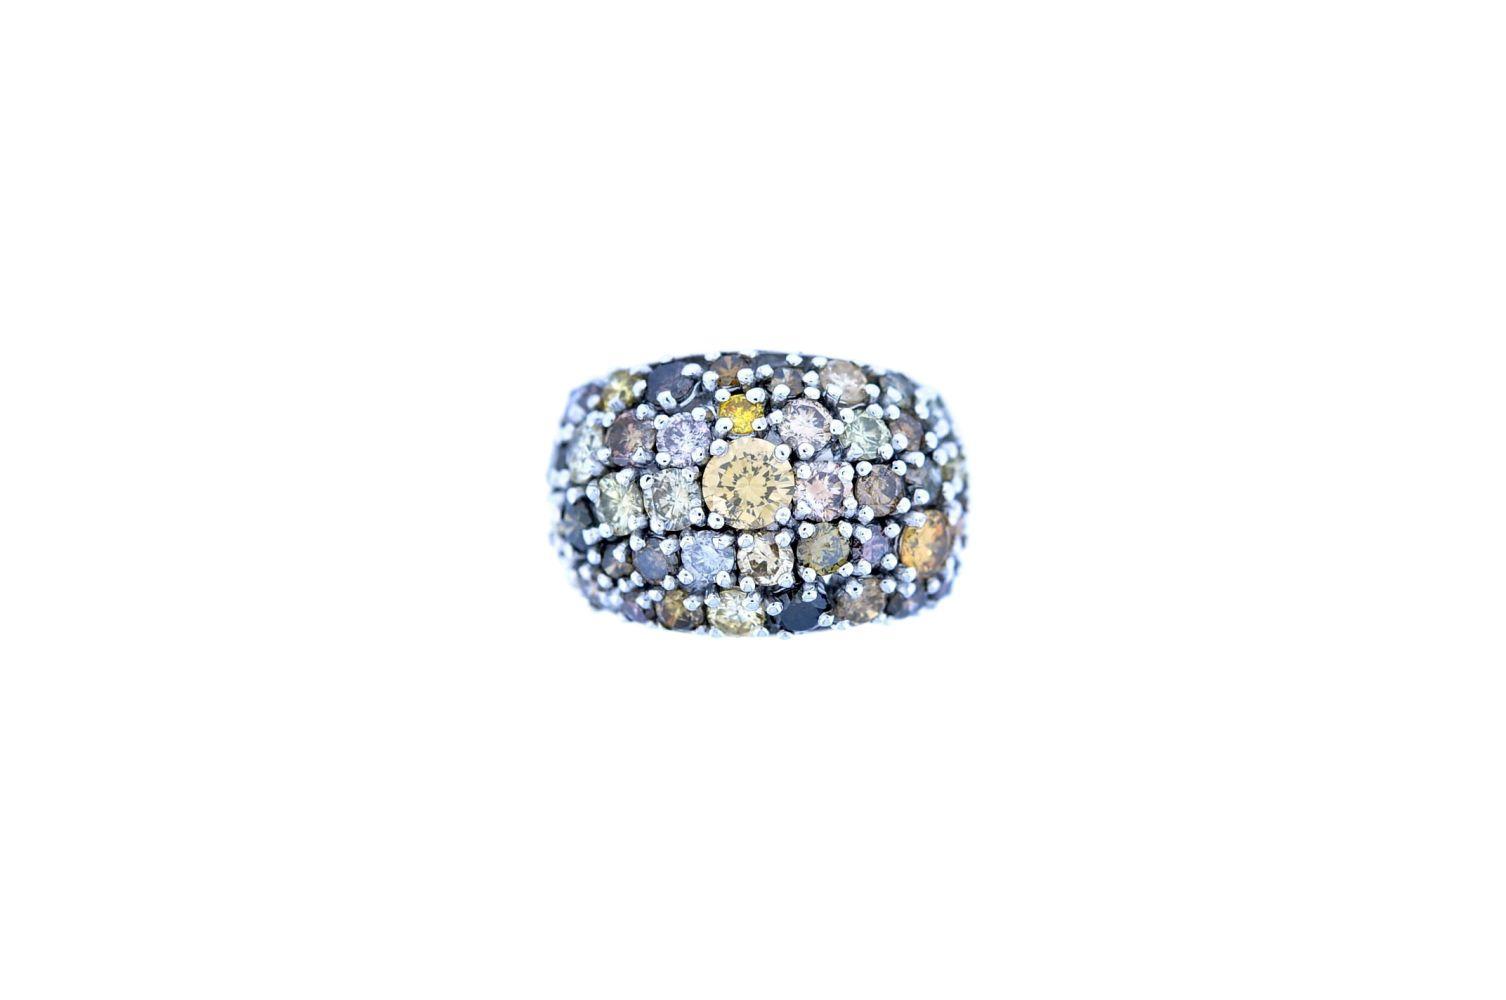 #13 Brilliant Ring | Brillantring Image